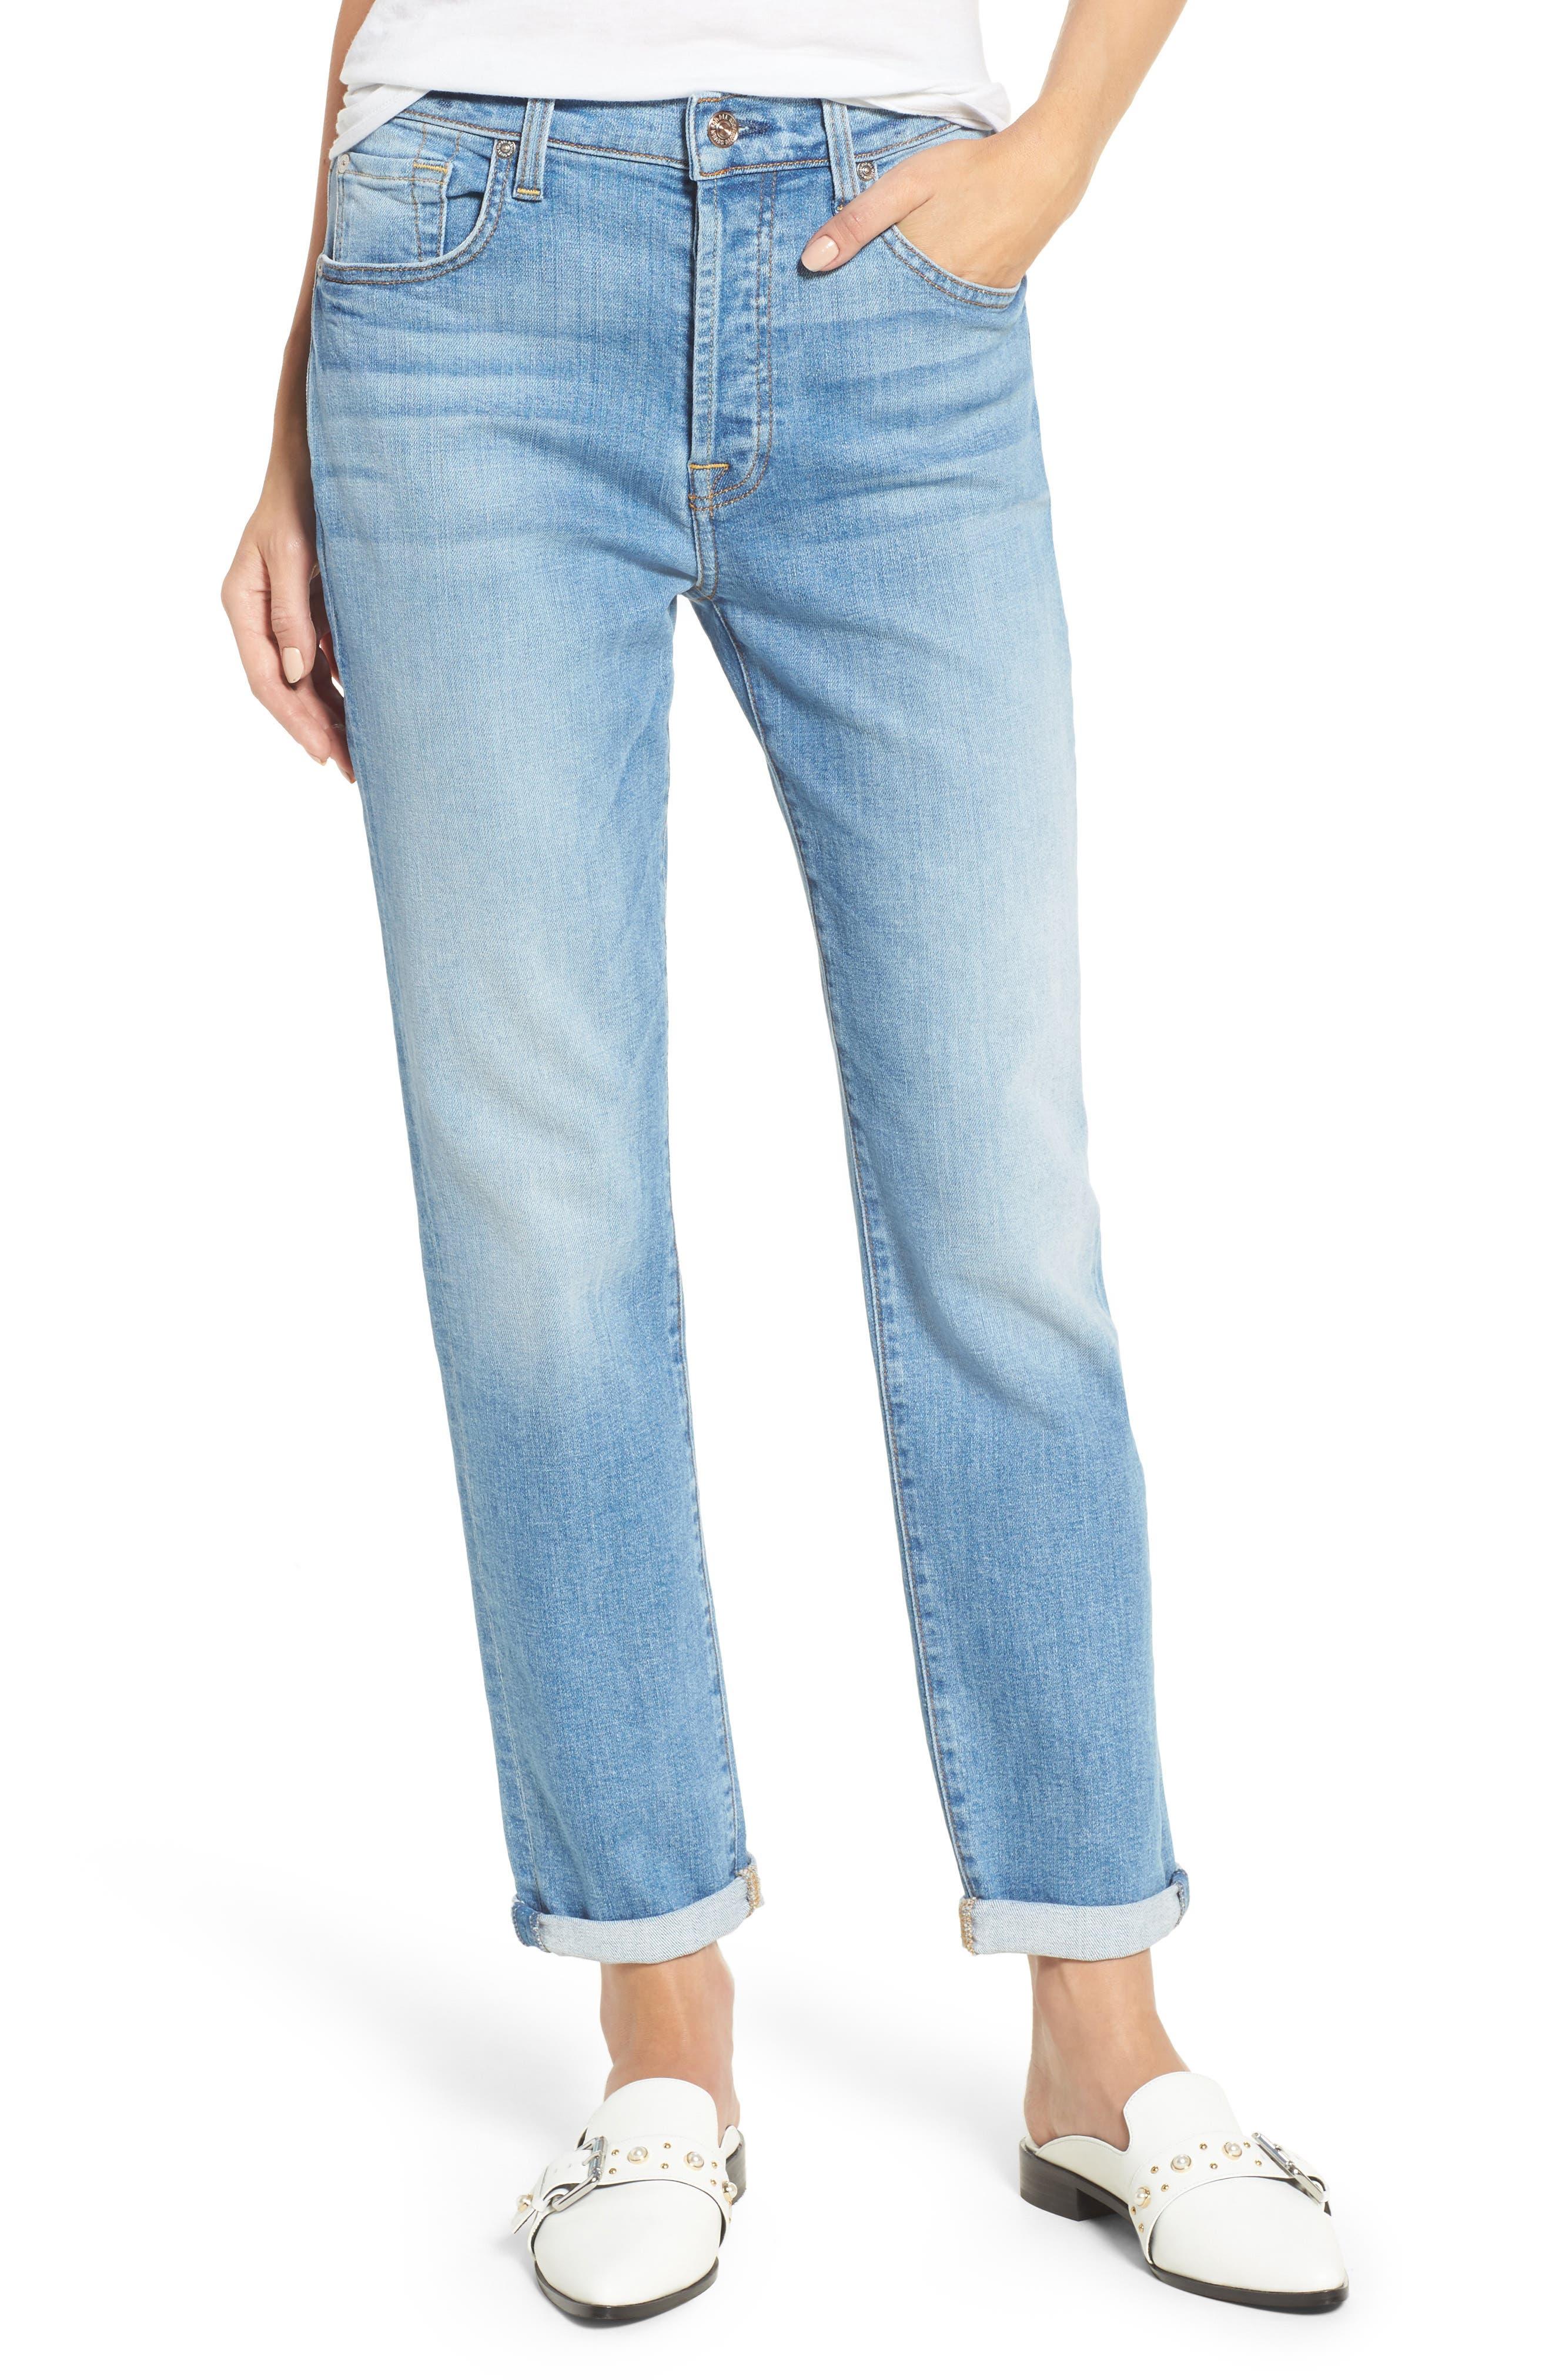 Josefina High Waist Crop Boyfriend Jeans,                         Main,                         color, East Village